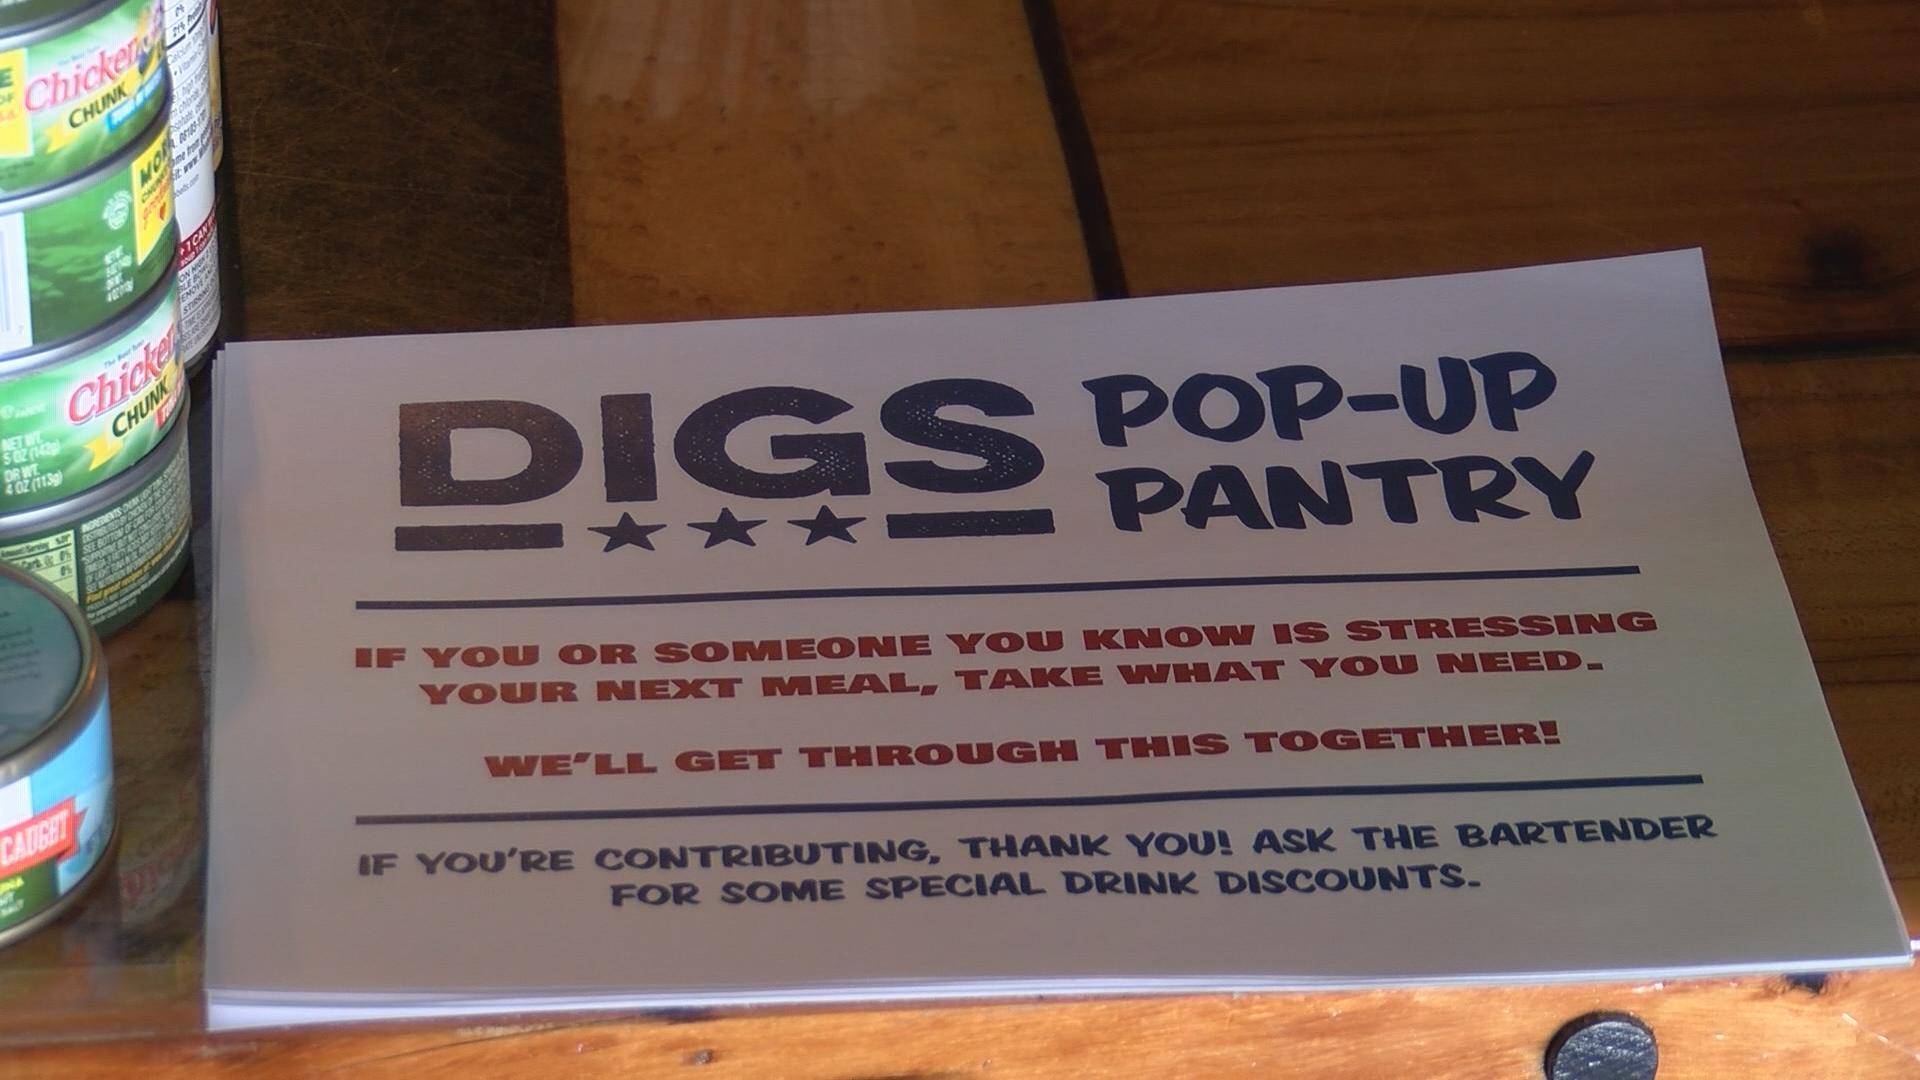 Dig's Pop Up Pantry